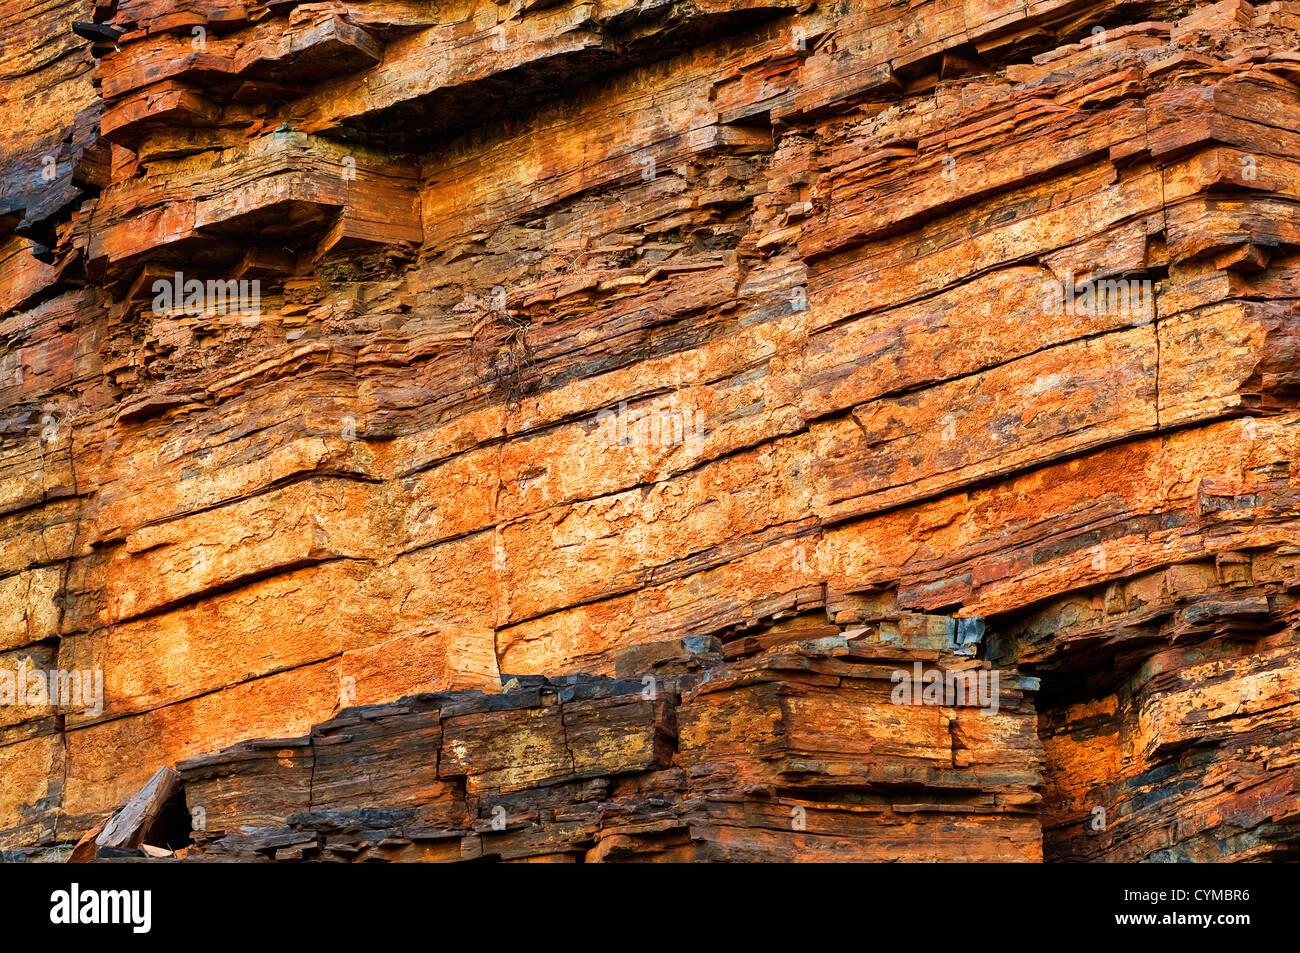 Pared de roca en Dales Gorge. Imagen De Stock